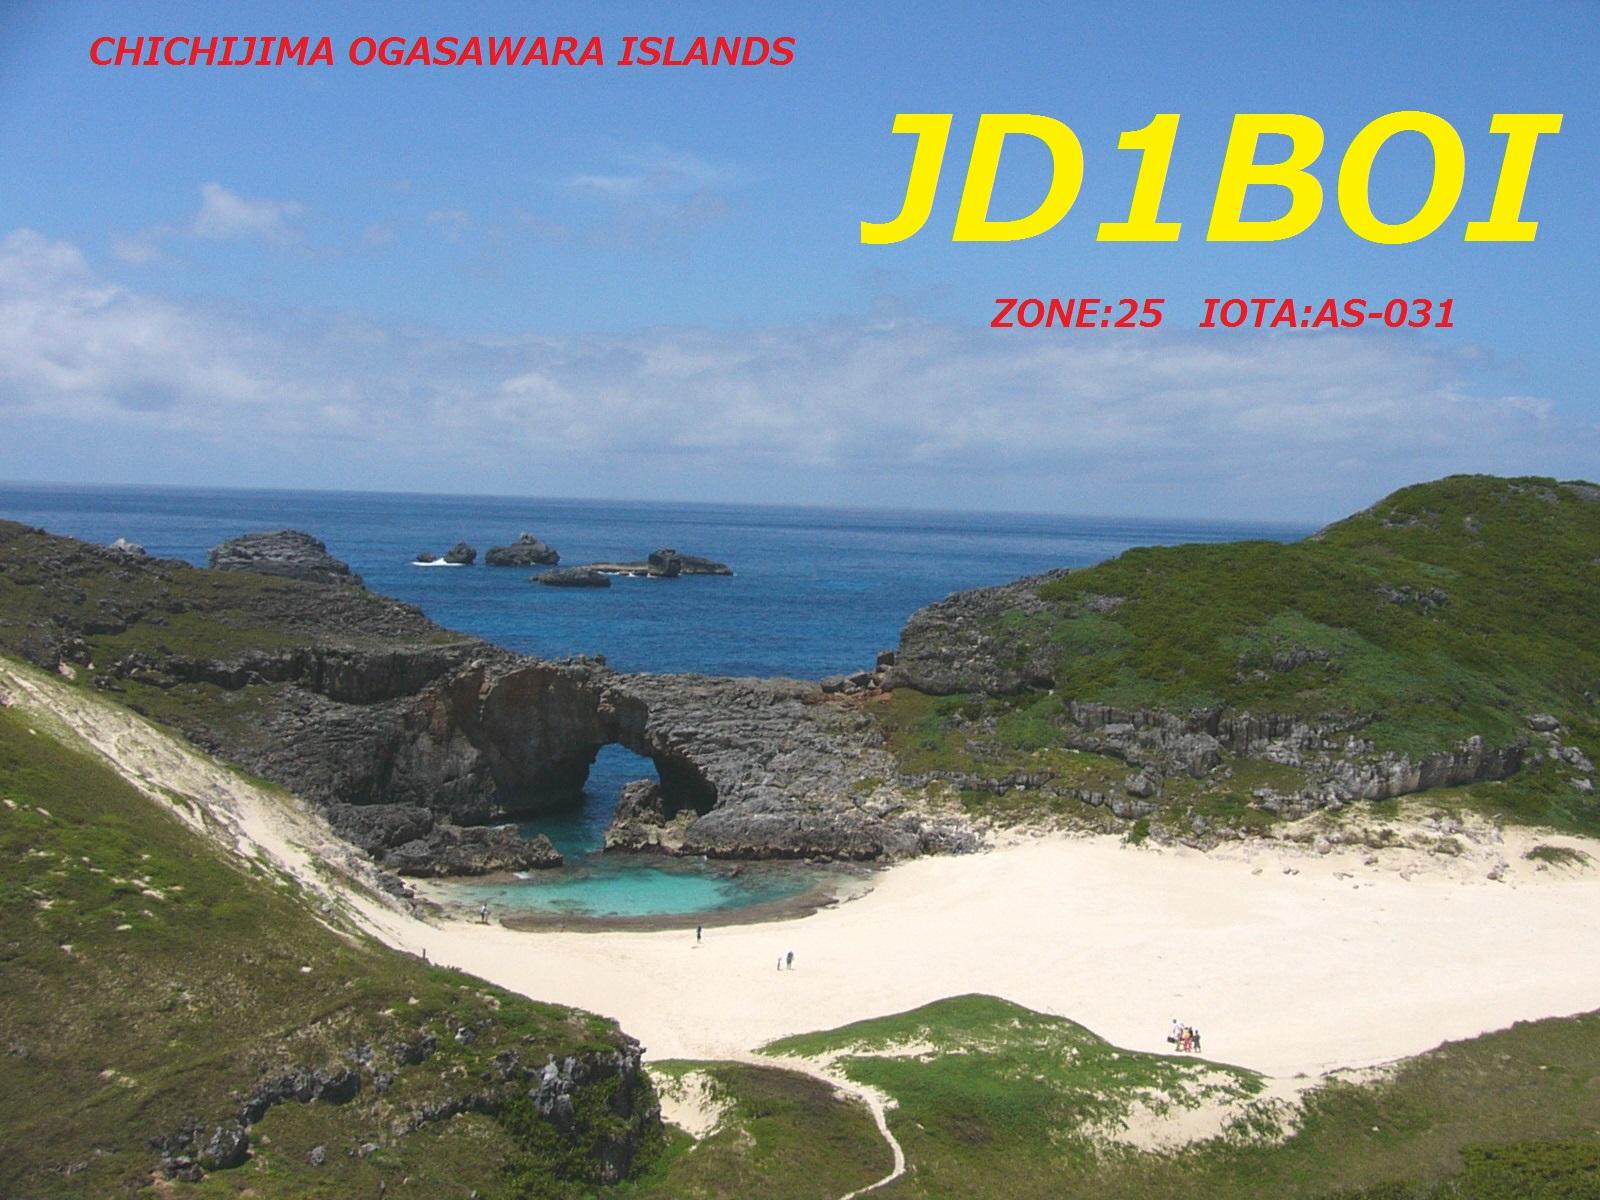 Остров Чичидзима Острова Огасавара JD1BOI